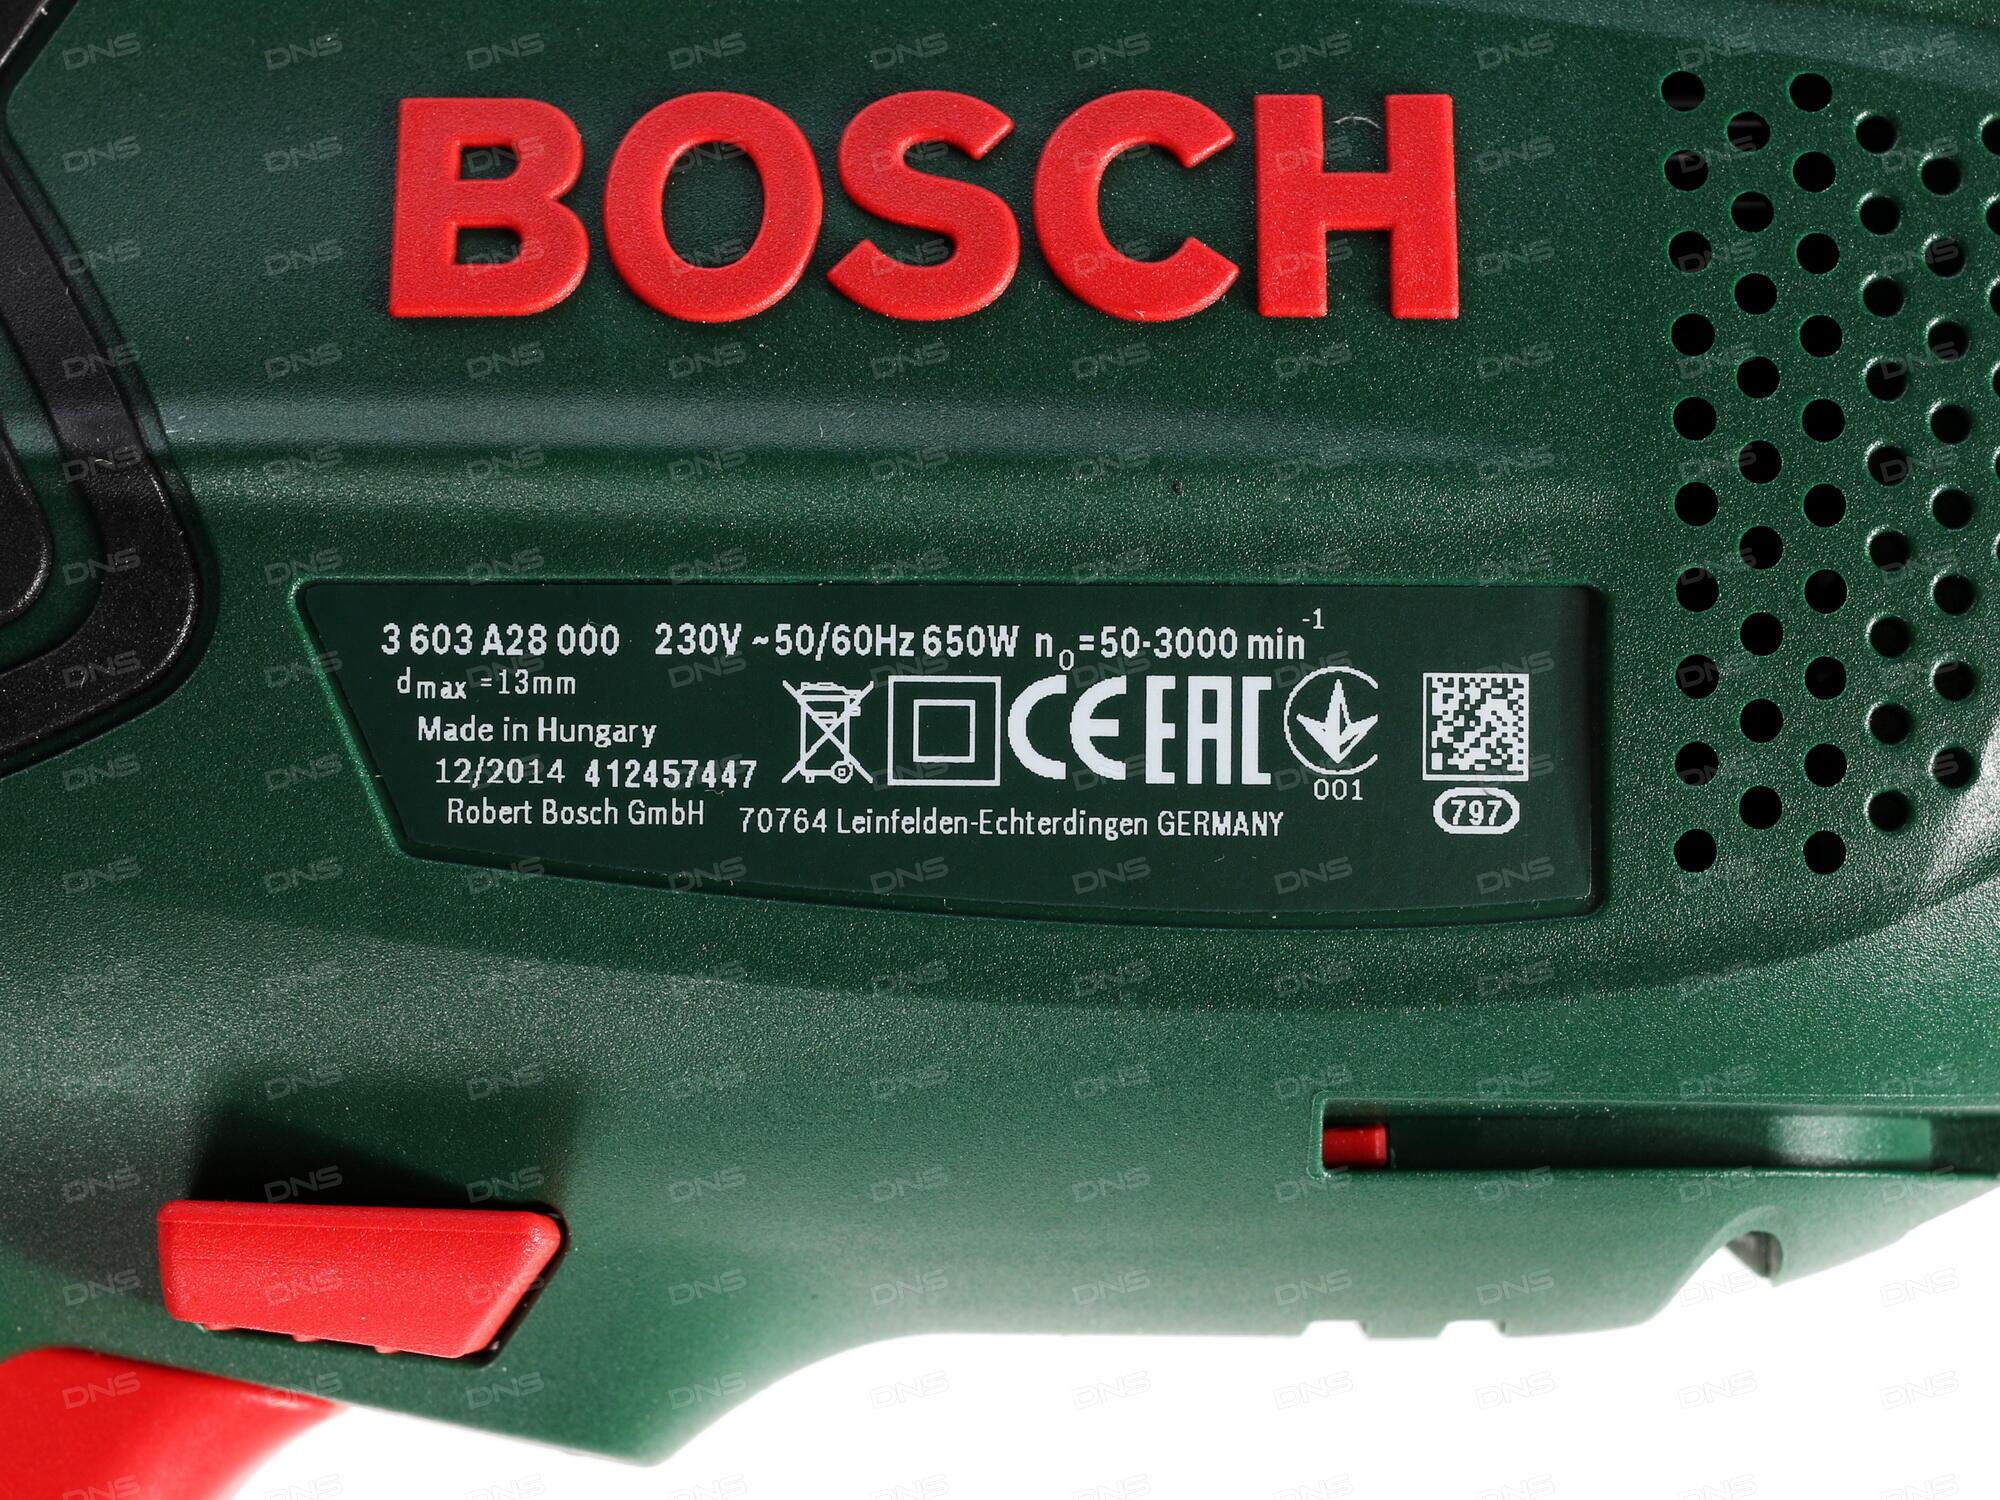 bosch psb 650 re dns 0152103. Black Bedroom Furniture Sets. Home Design Ideas